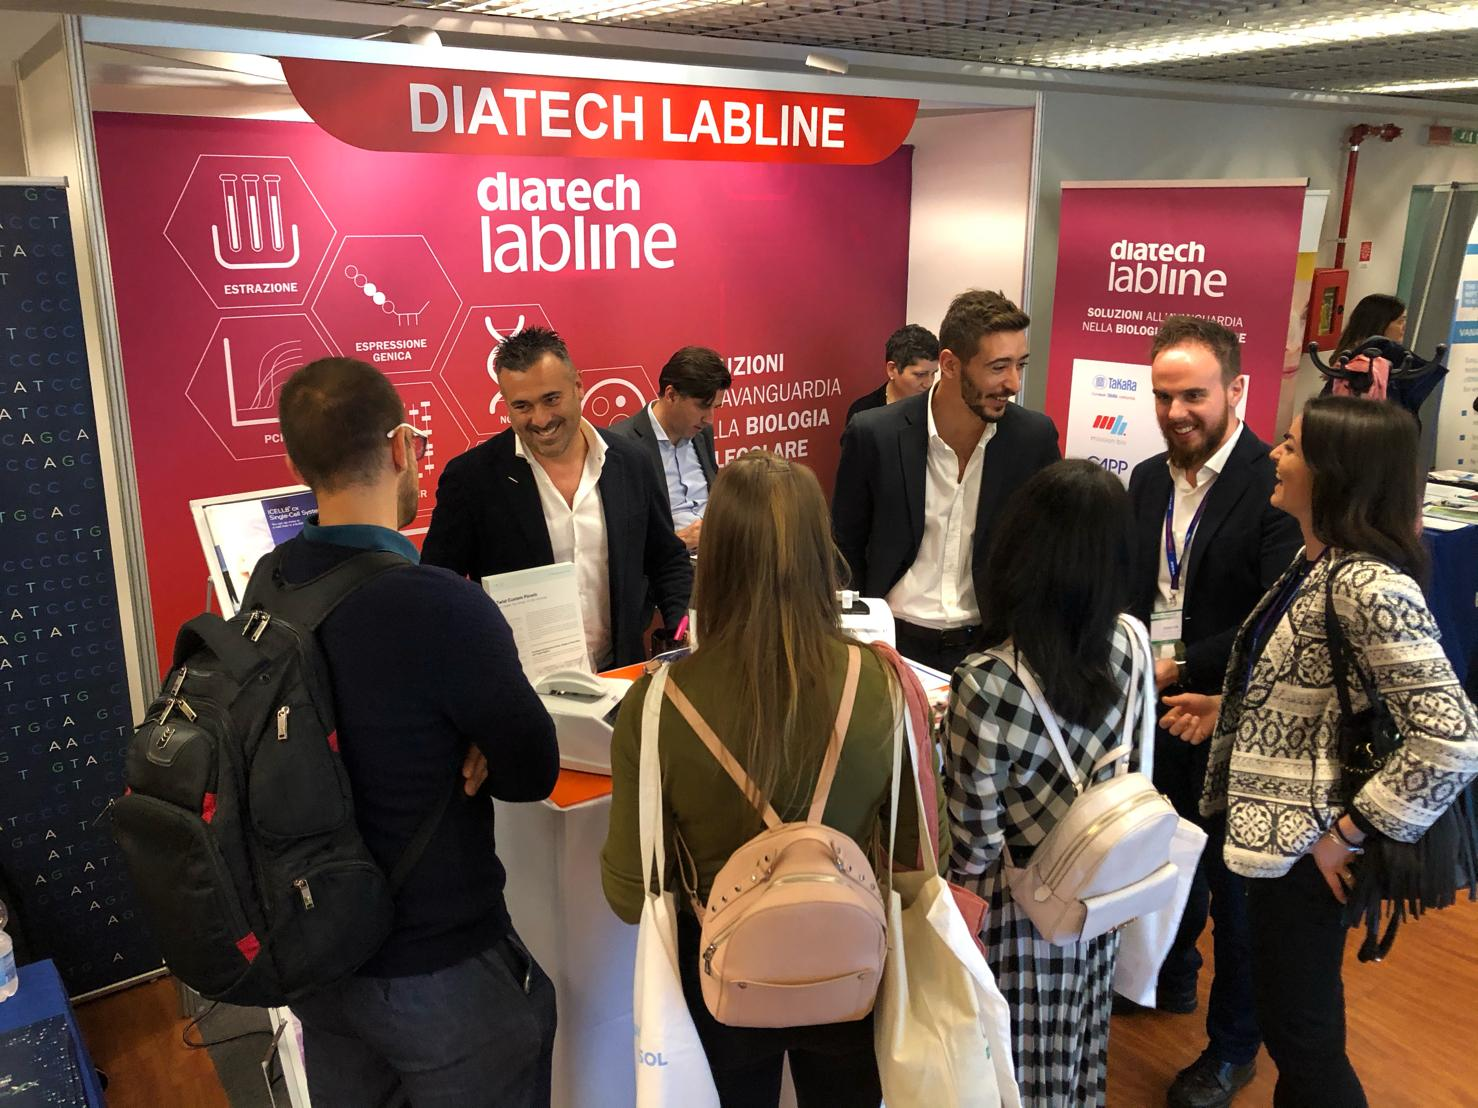 Diatech Labline stand